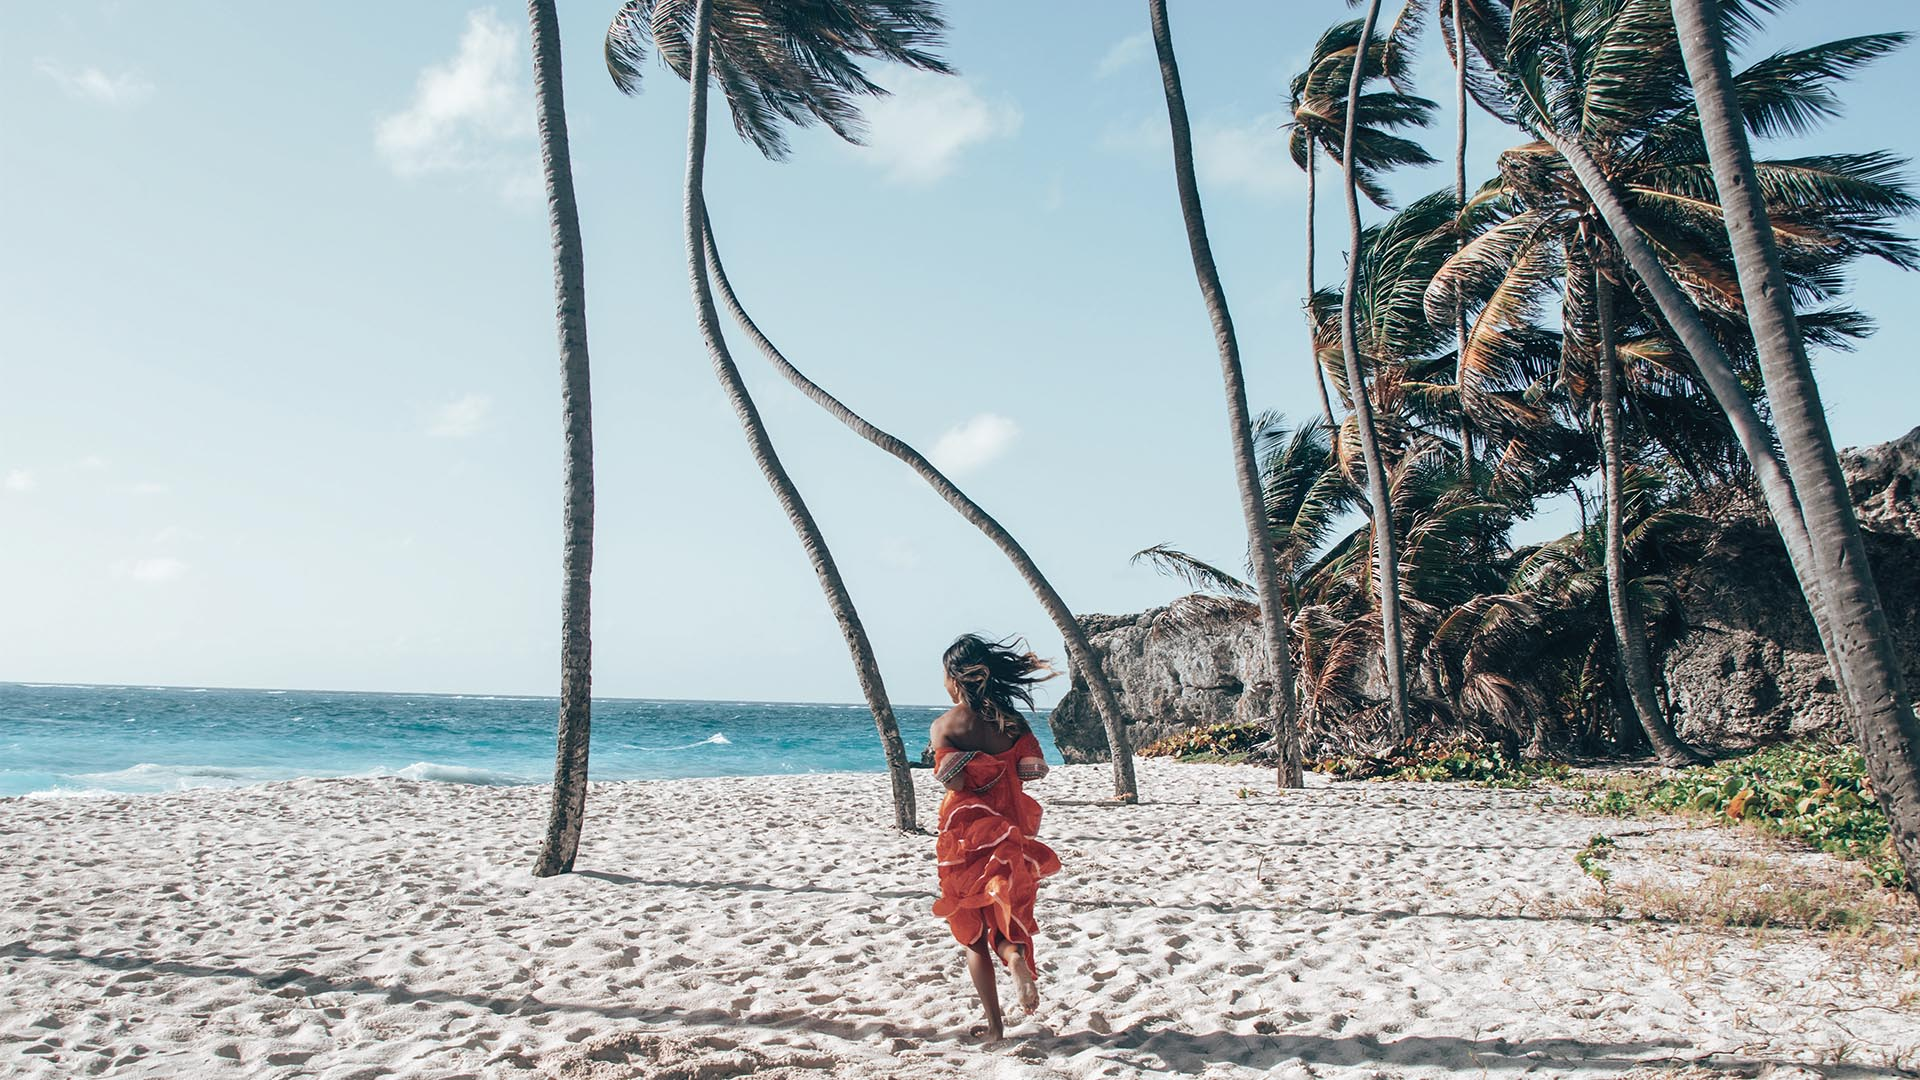 Caribbean island hopping in the Lesser Antilles